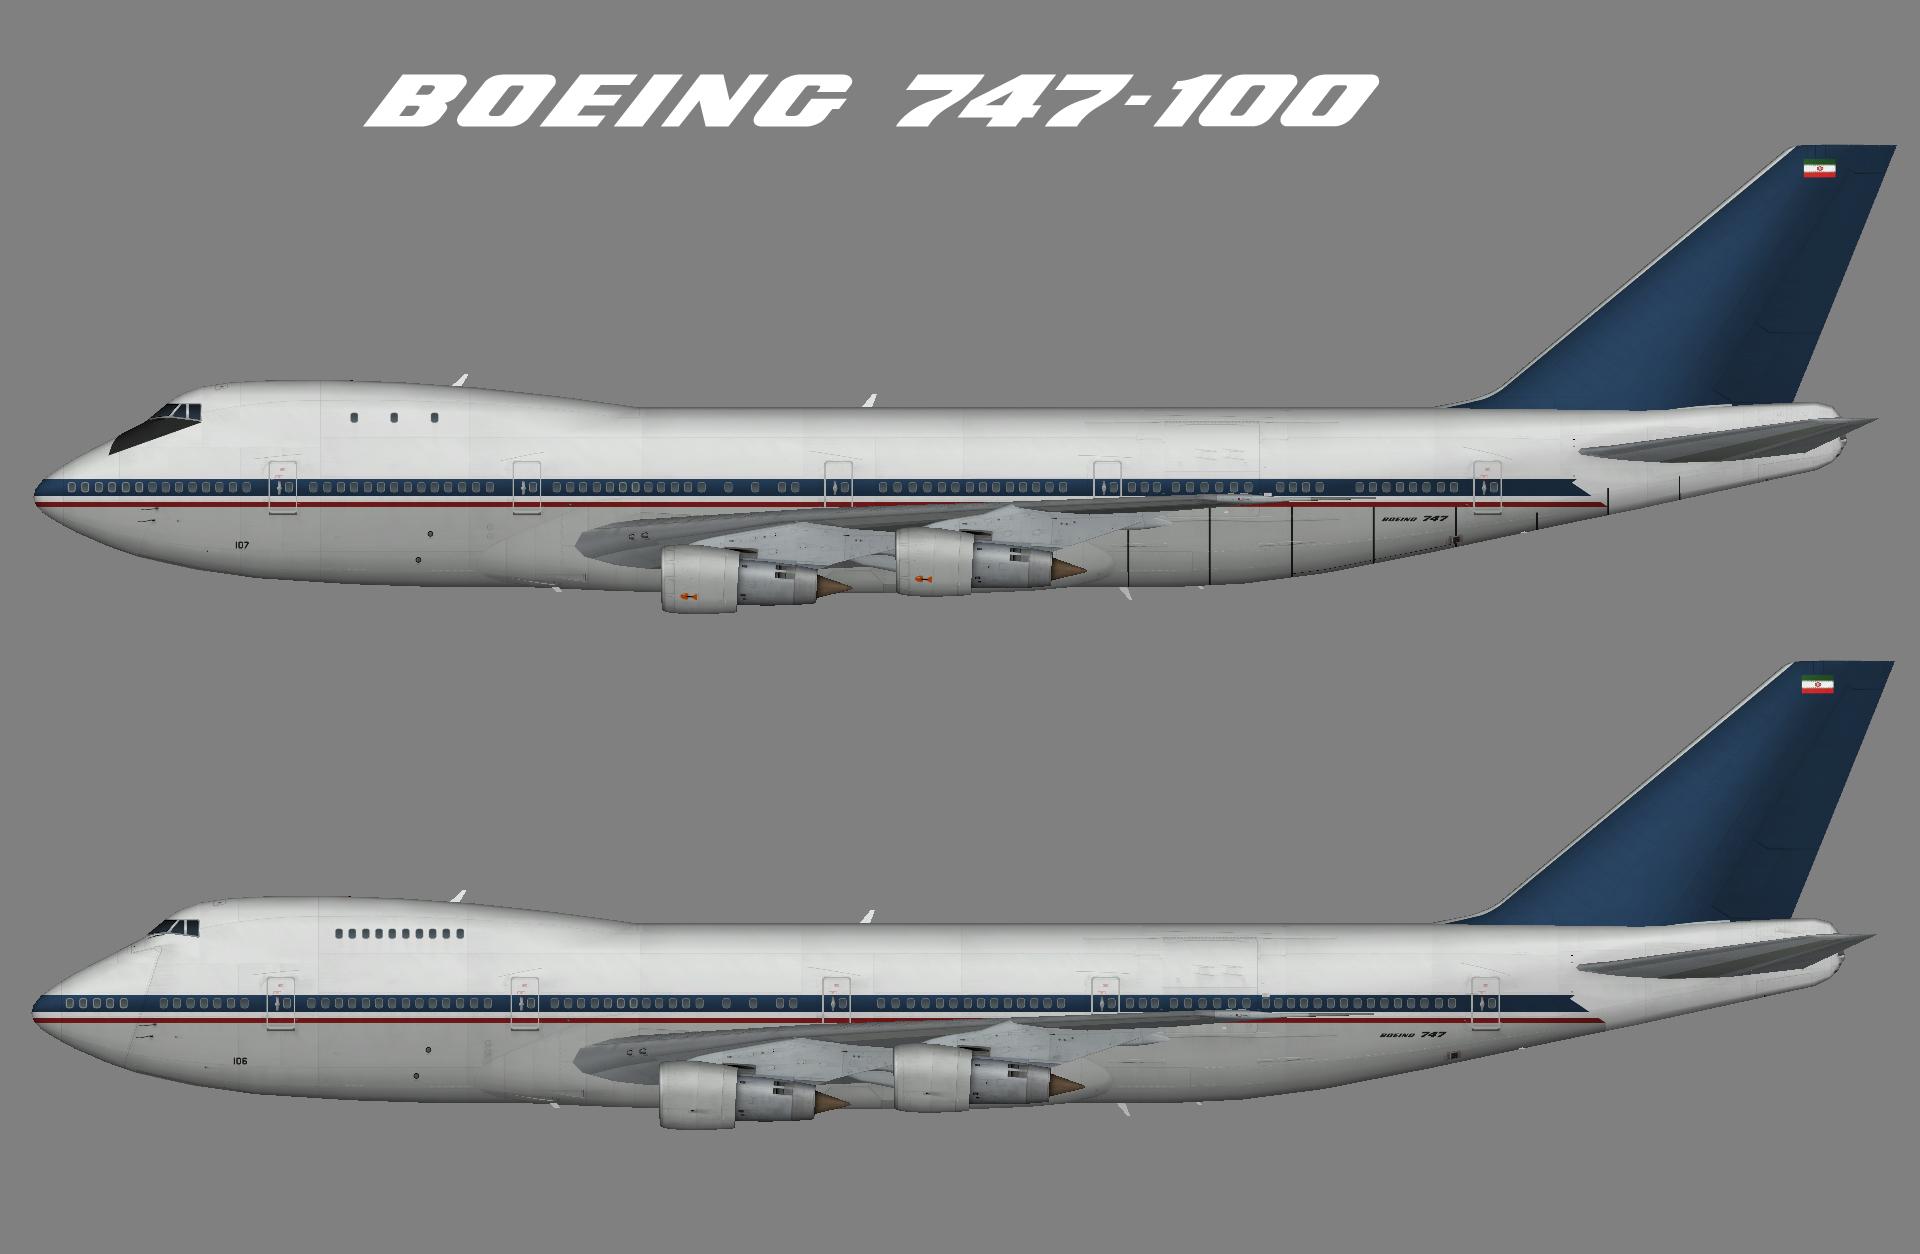 Iran Air Force 747-100